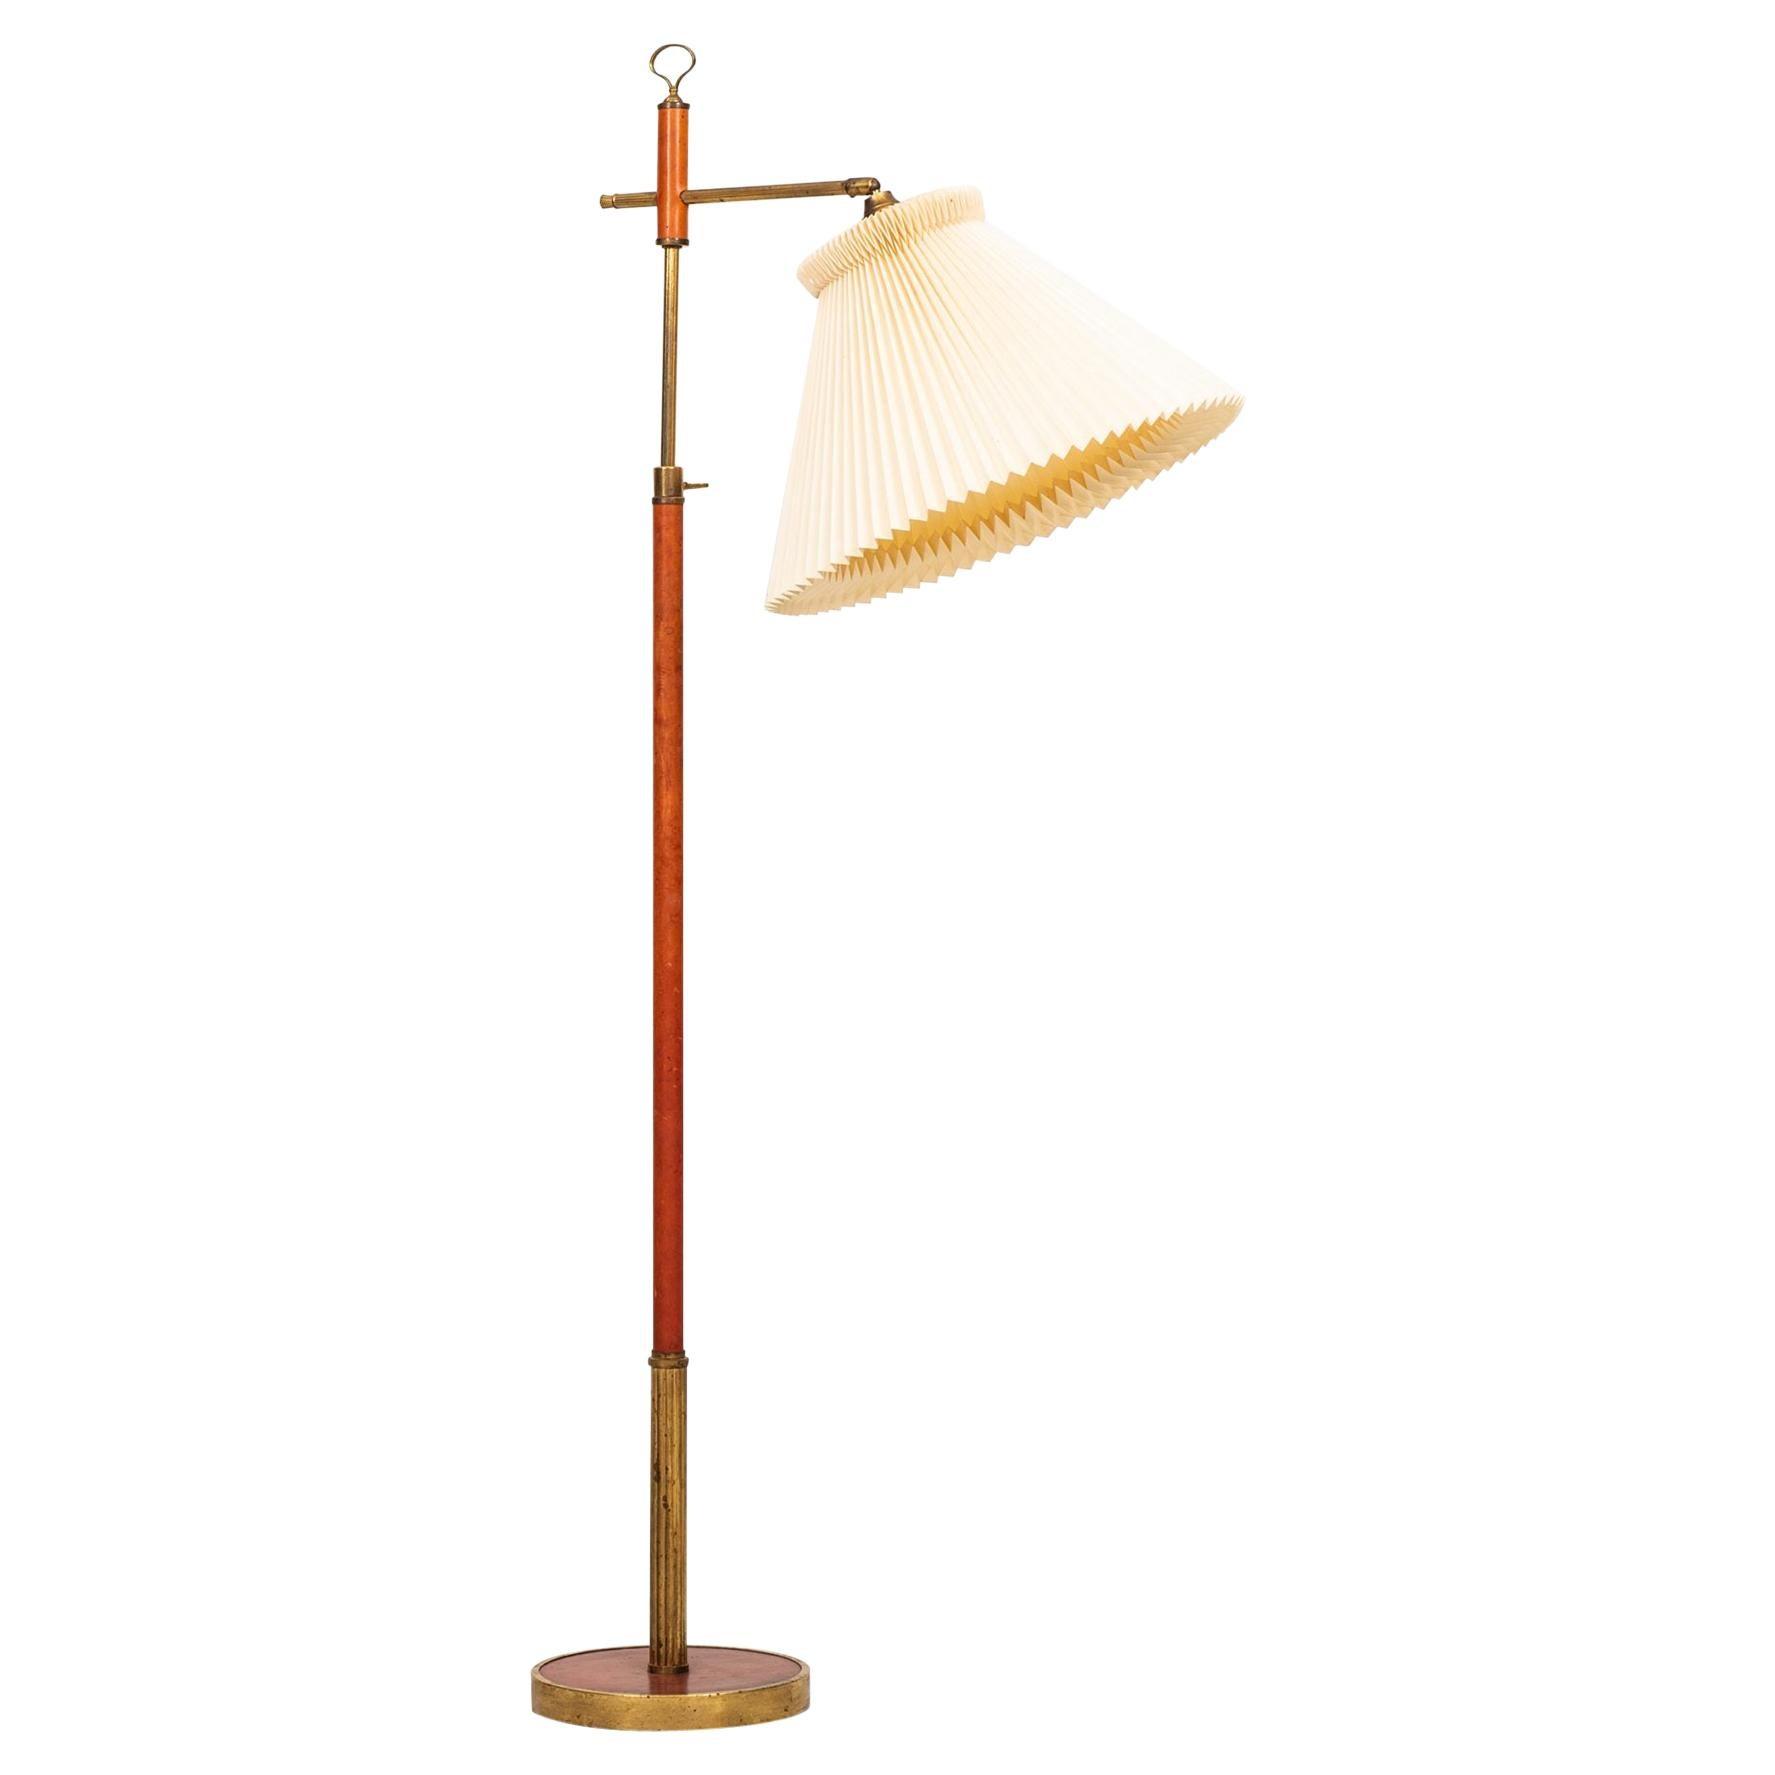 Floor Lamp Produced in Denmark